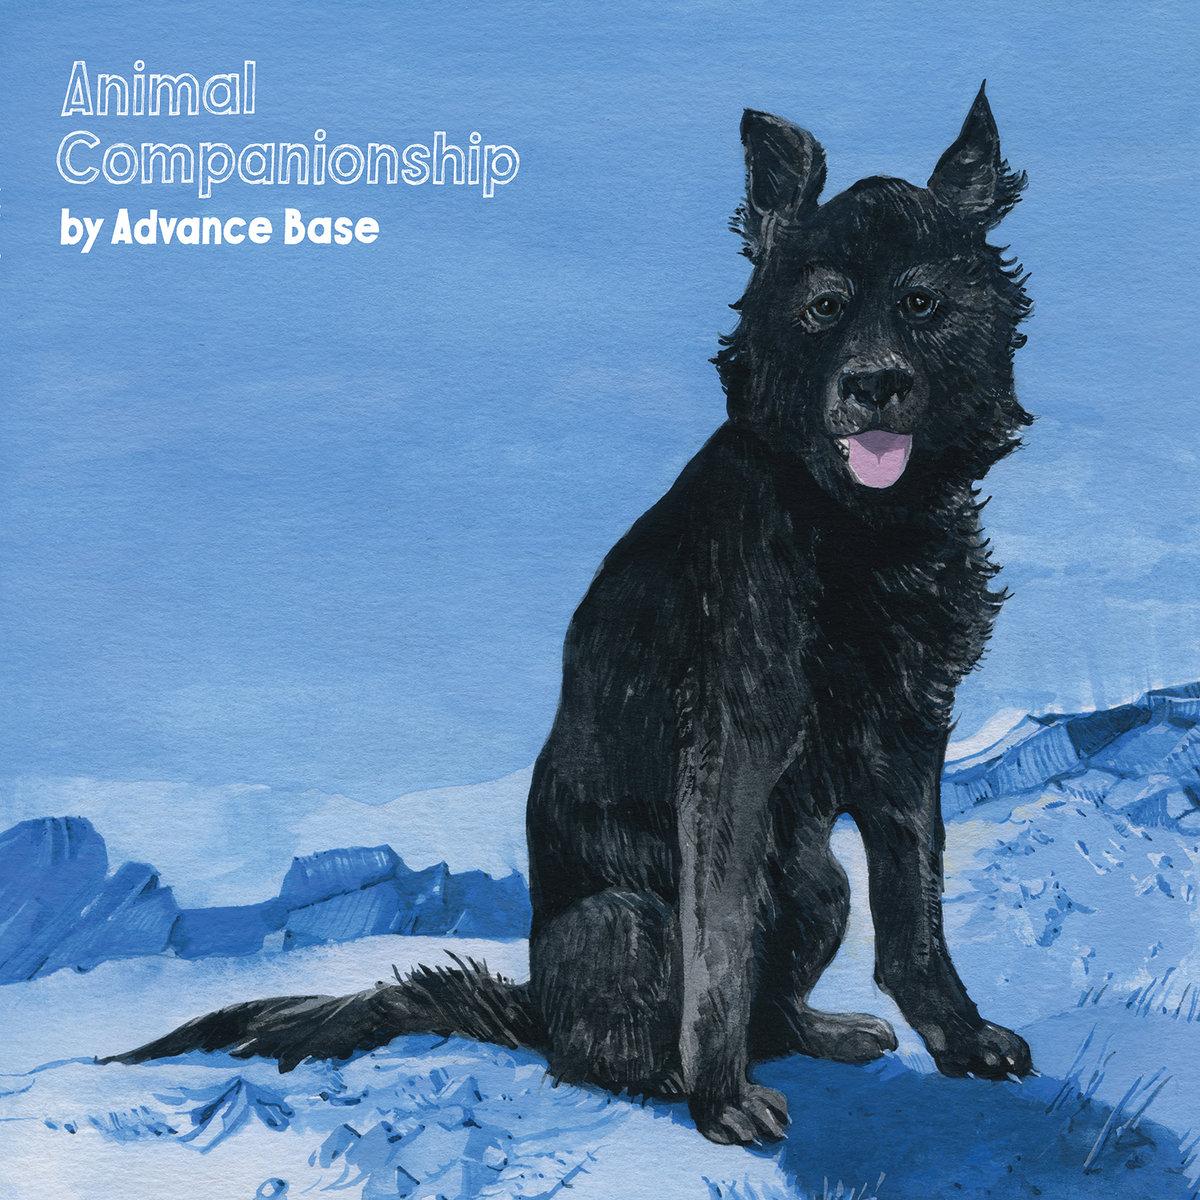 Advance Base animal companionship artwork